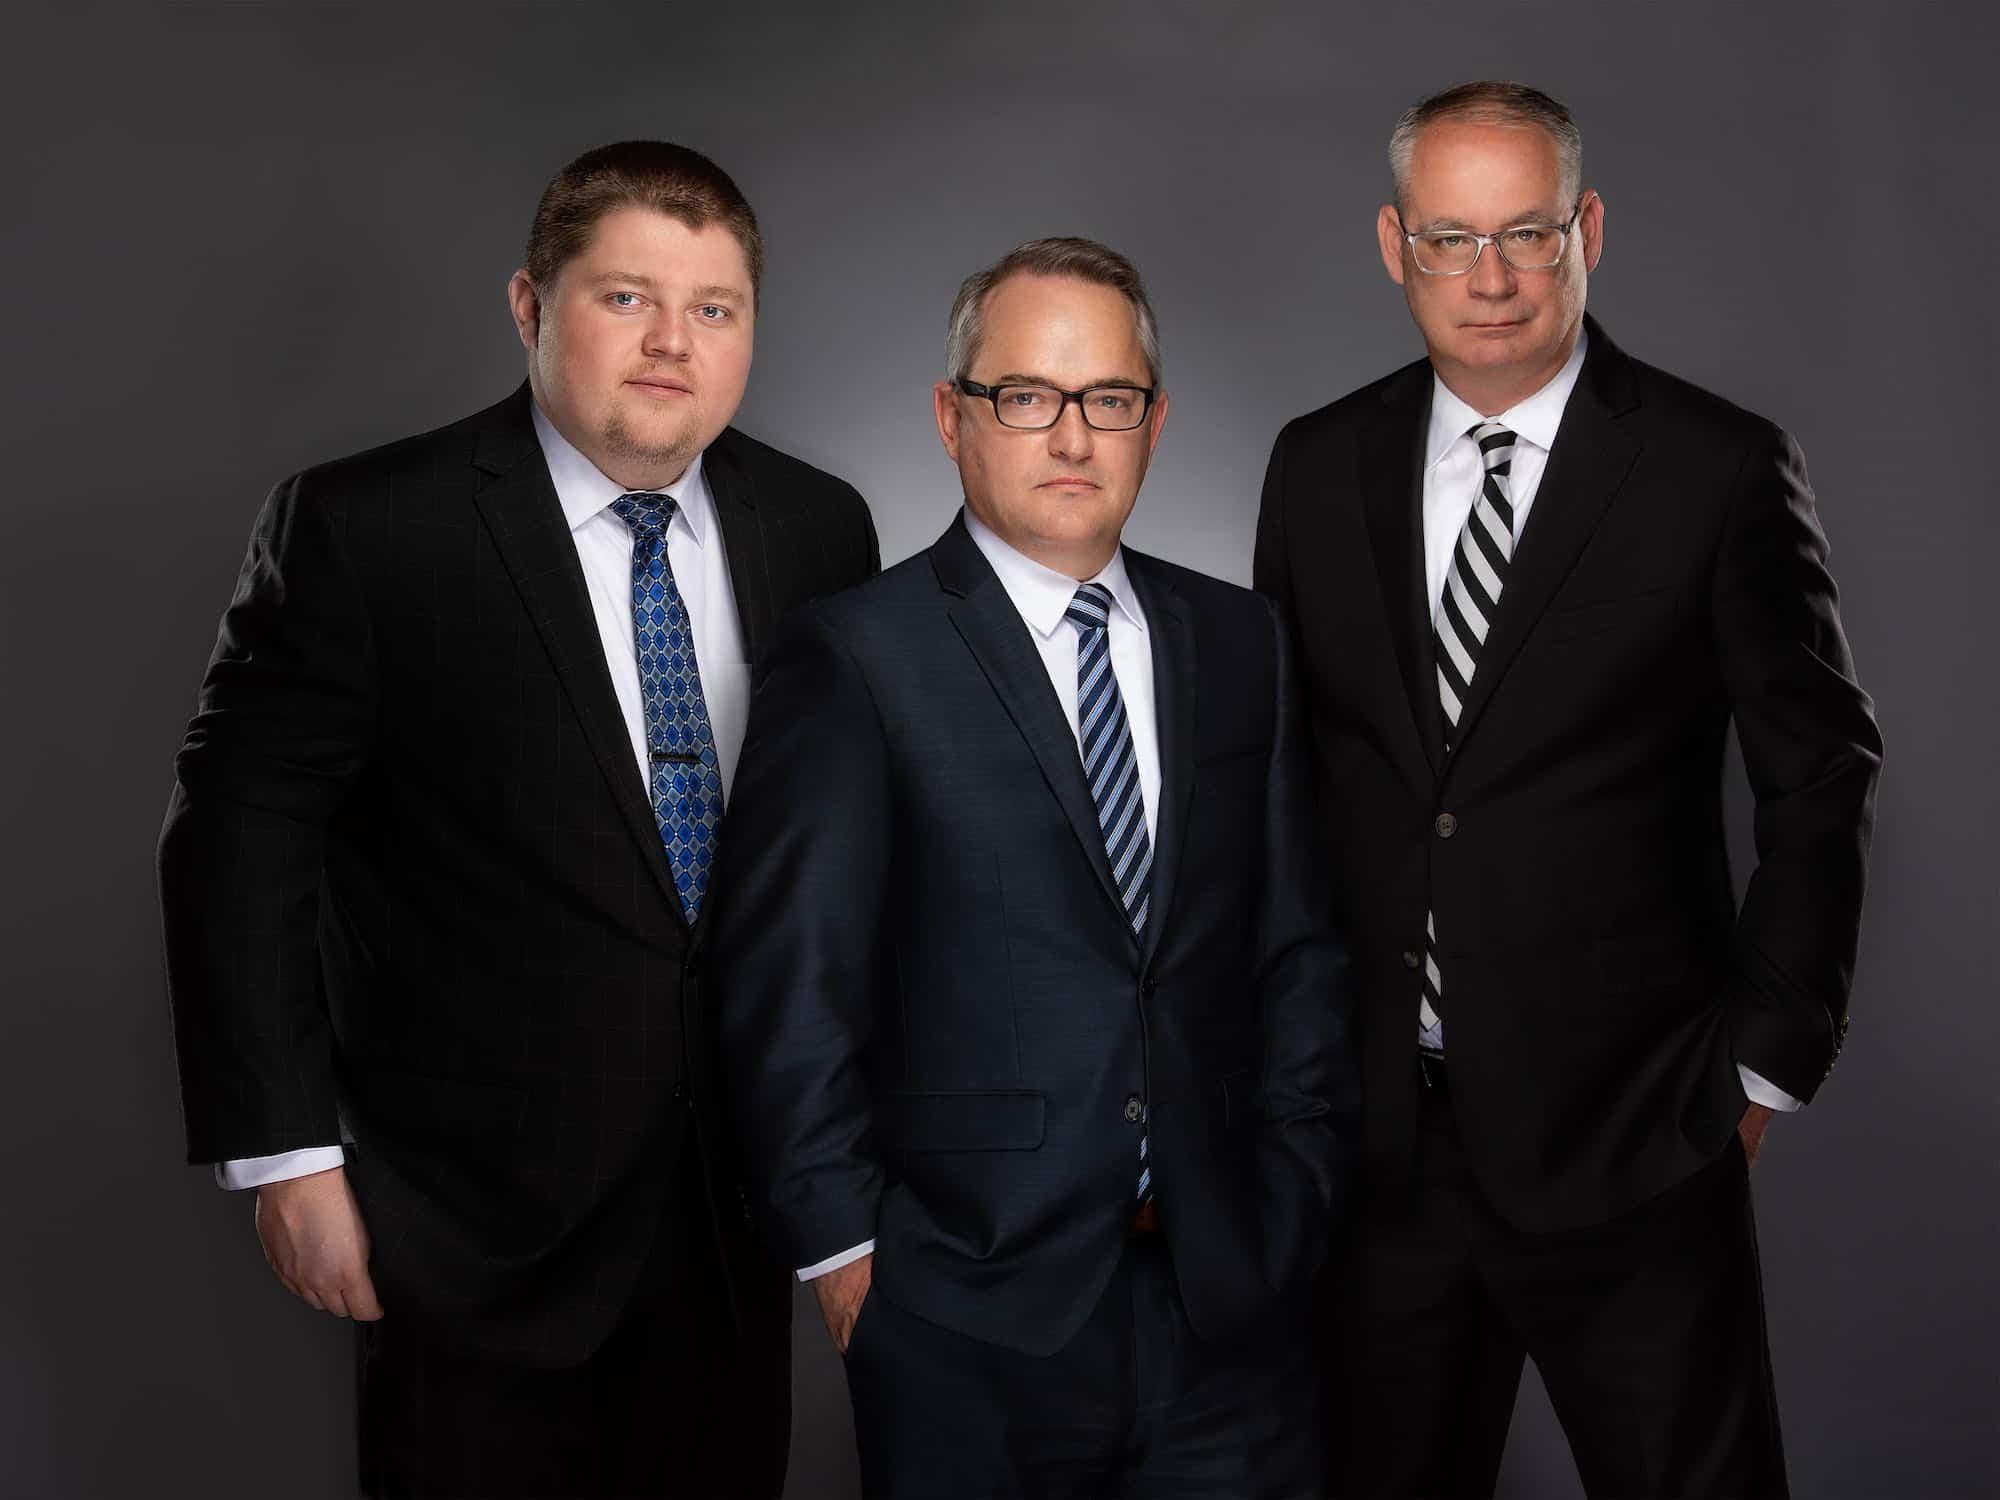 the alvine weidenaar injury law team